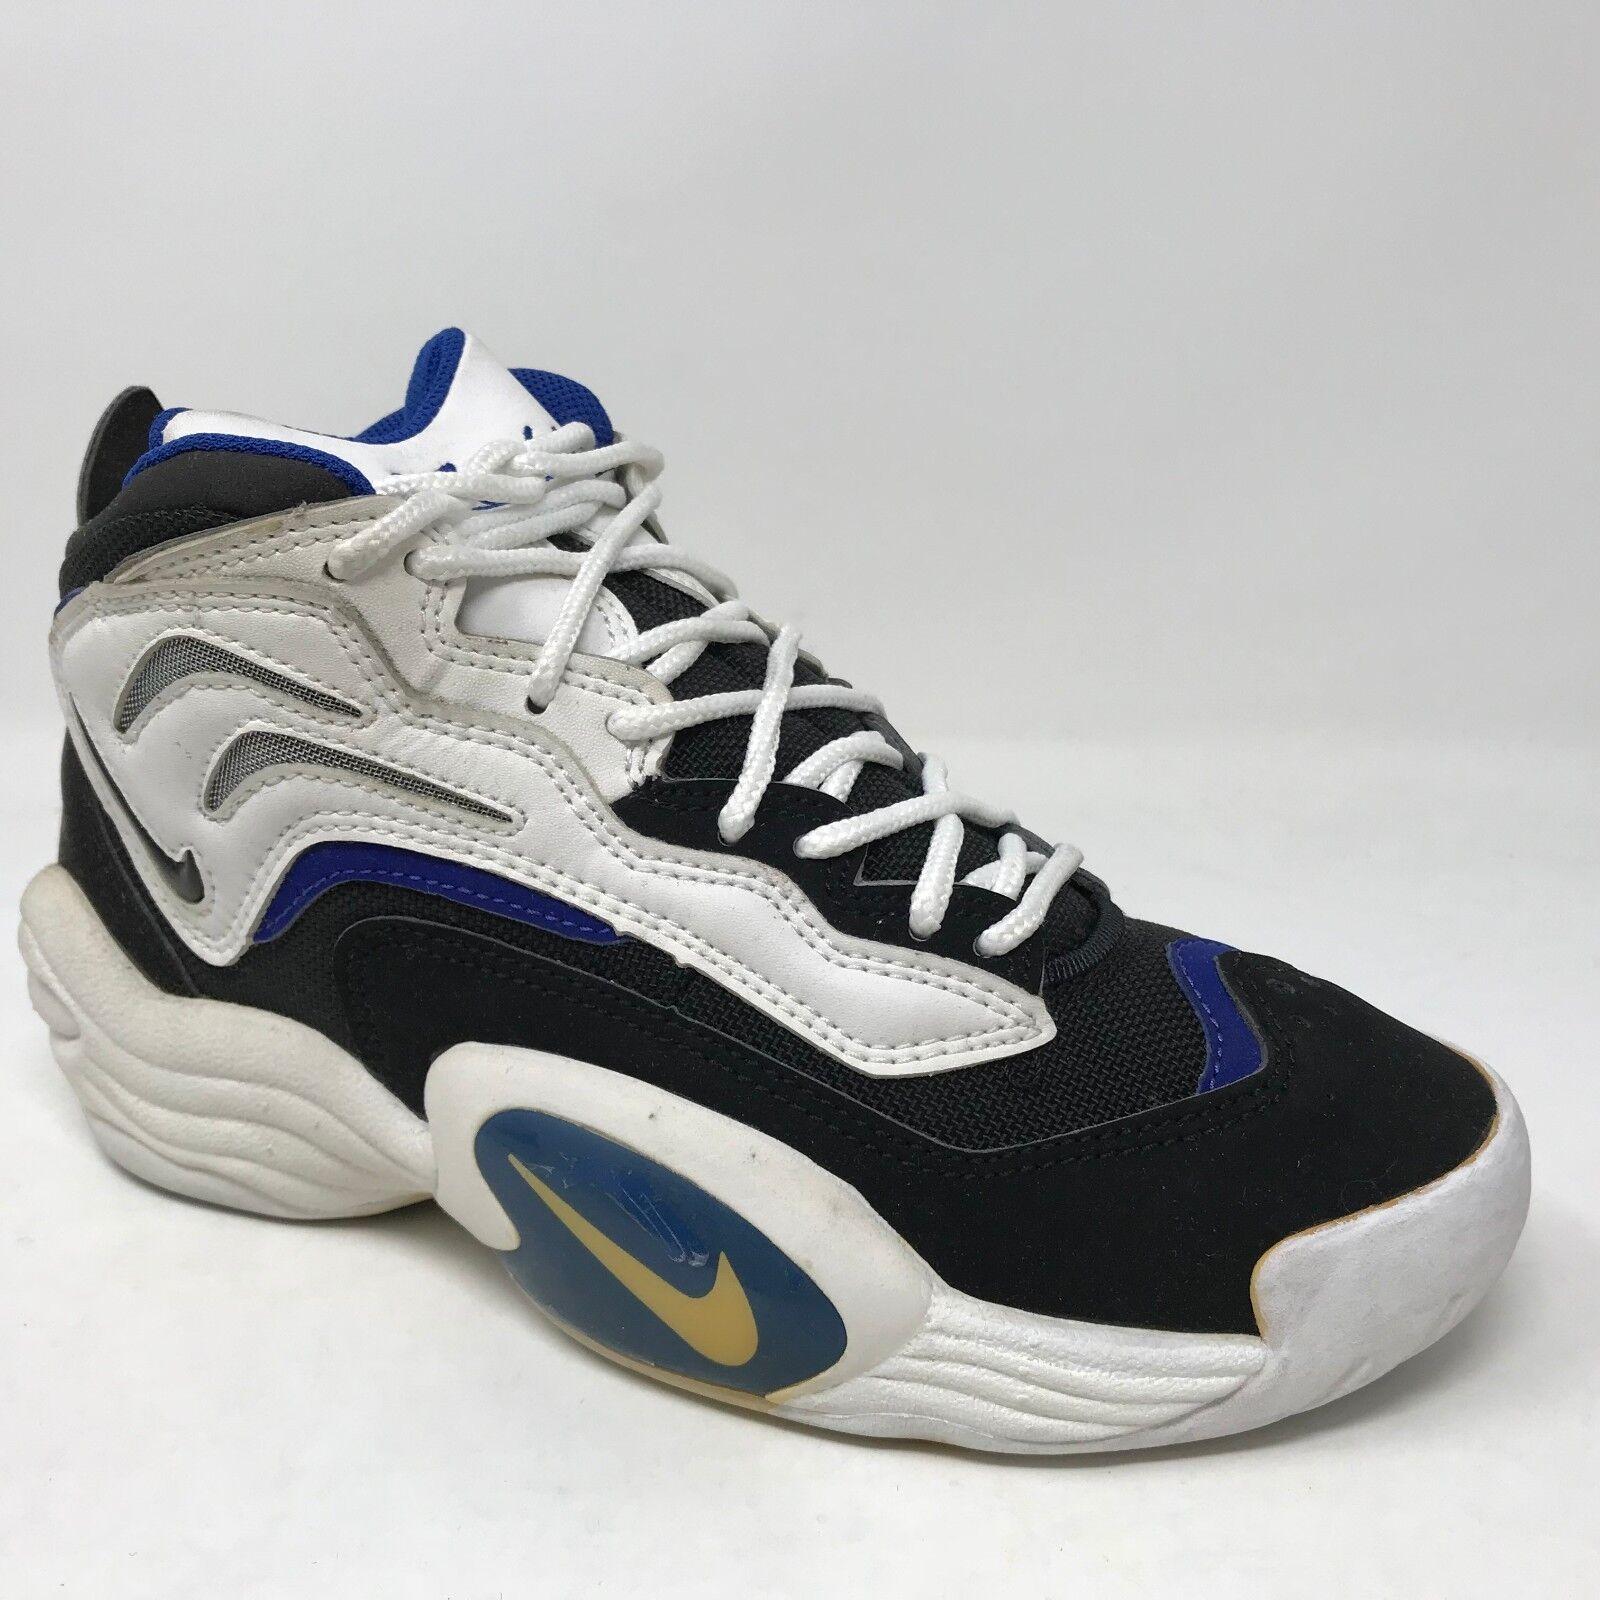 New Vintage Men Nike Air Maestro 130595-001 Size 7.5